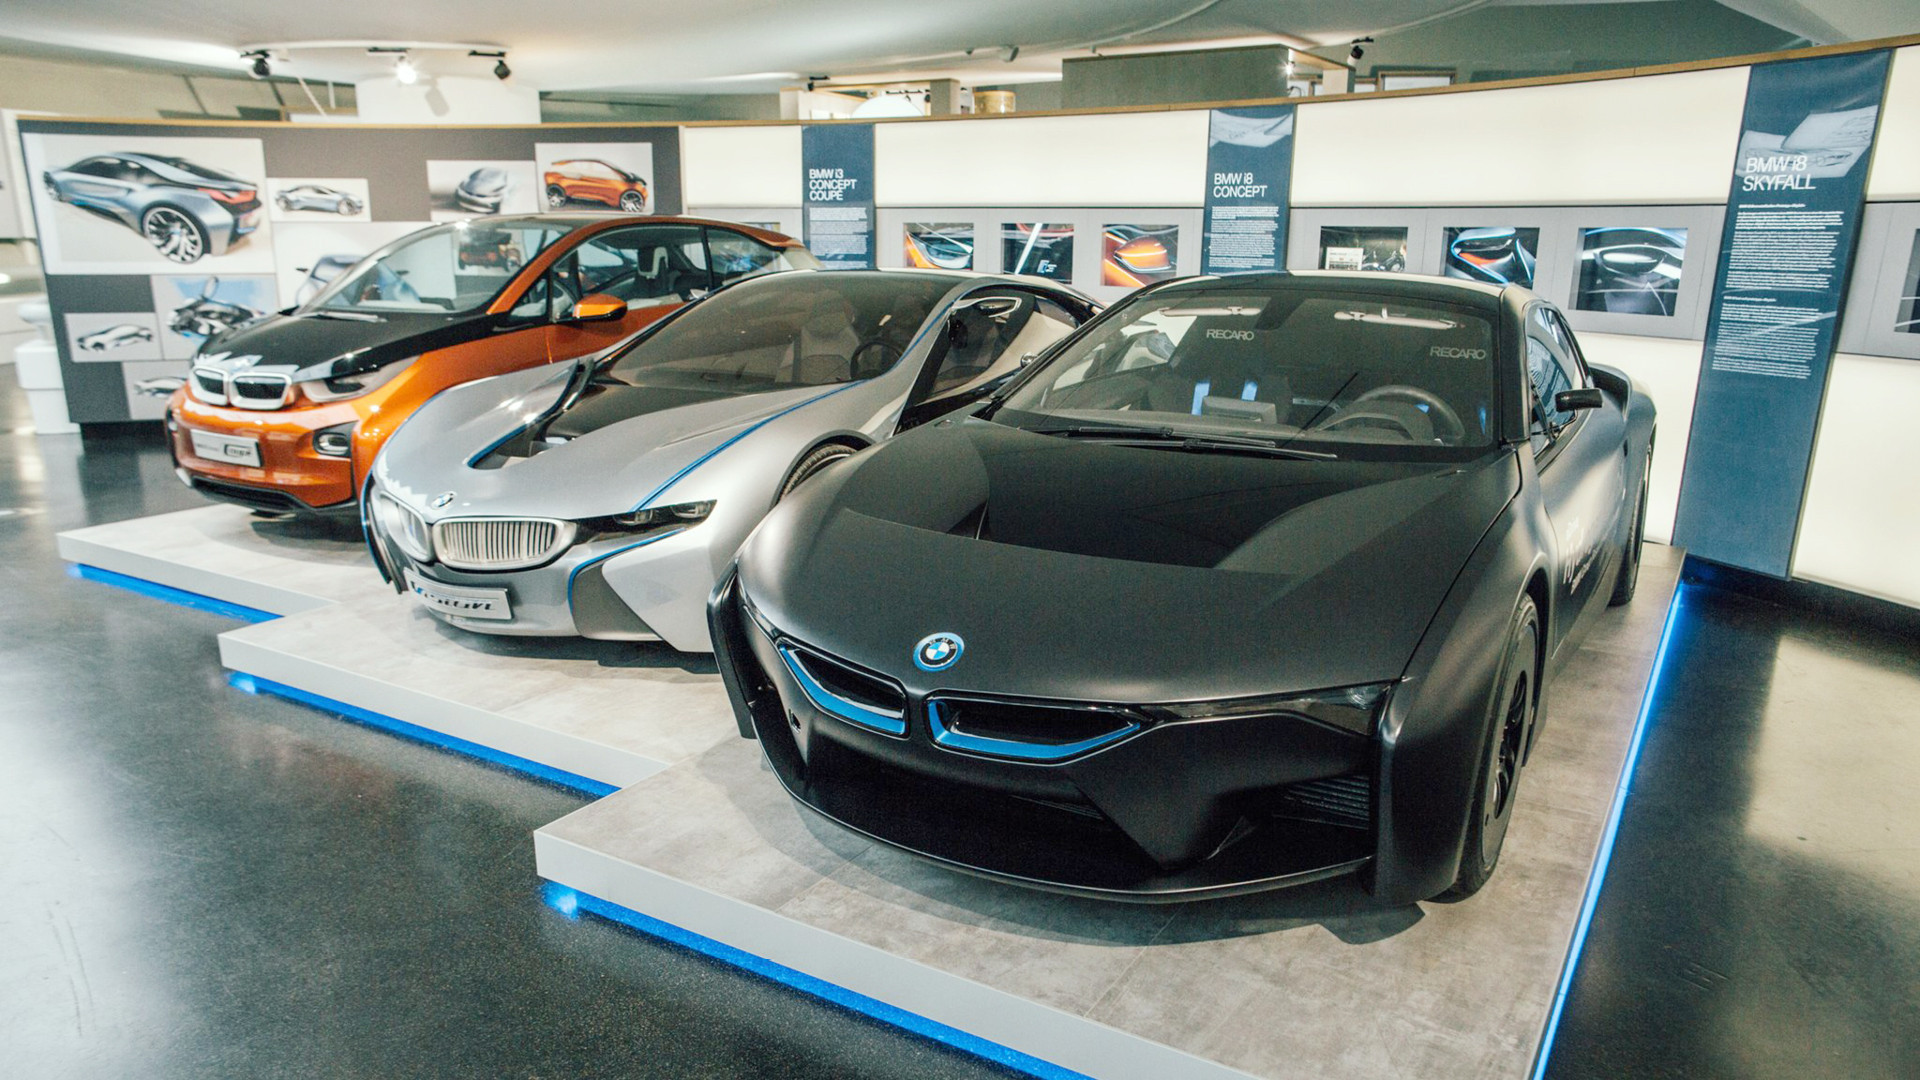 180518_BMWi_Museum_01.jpg